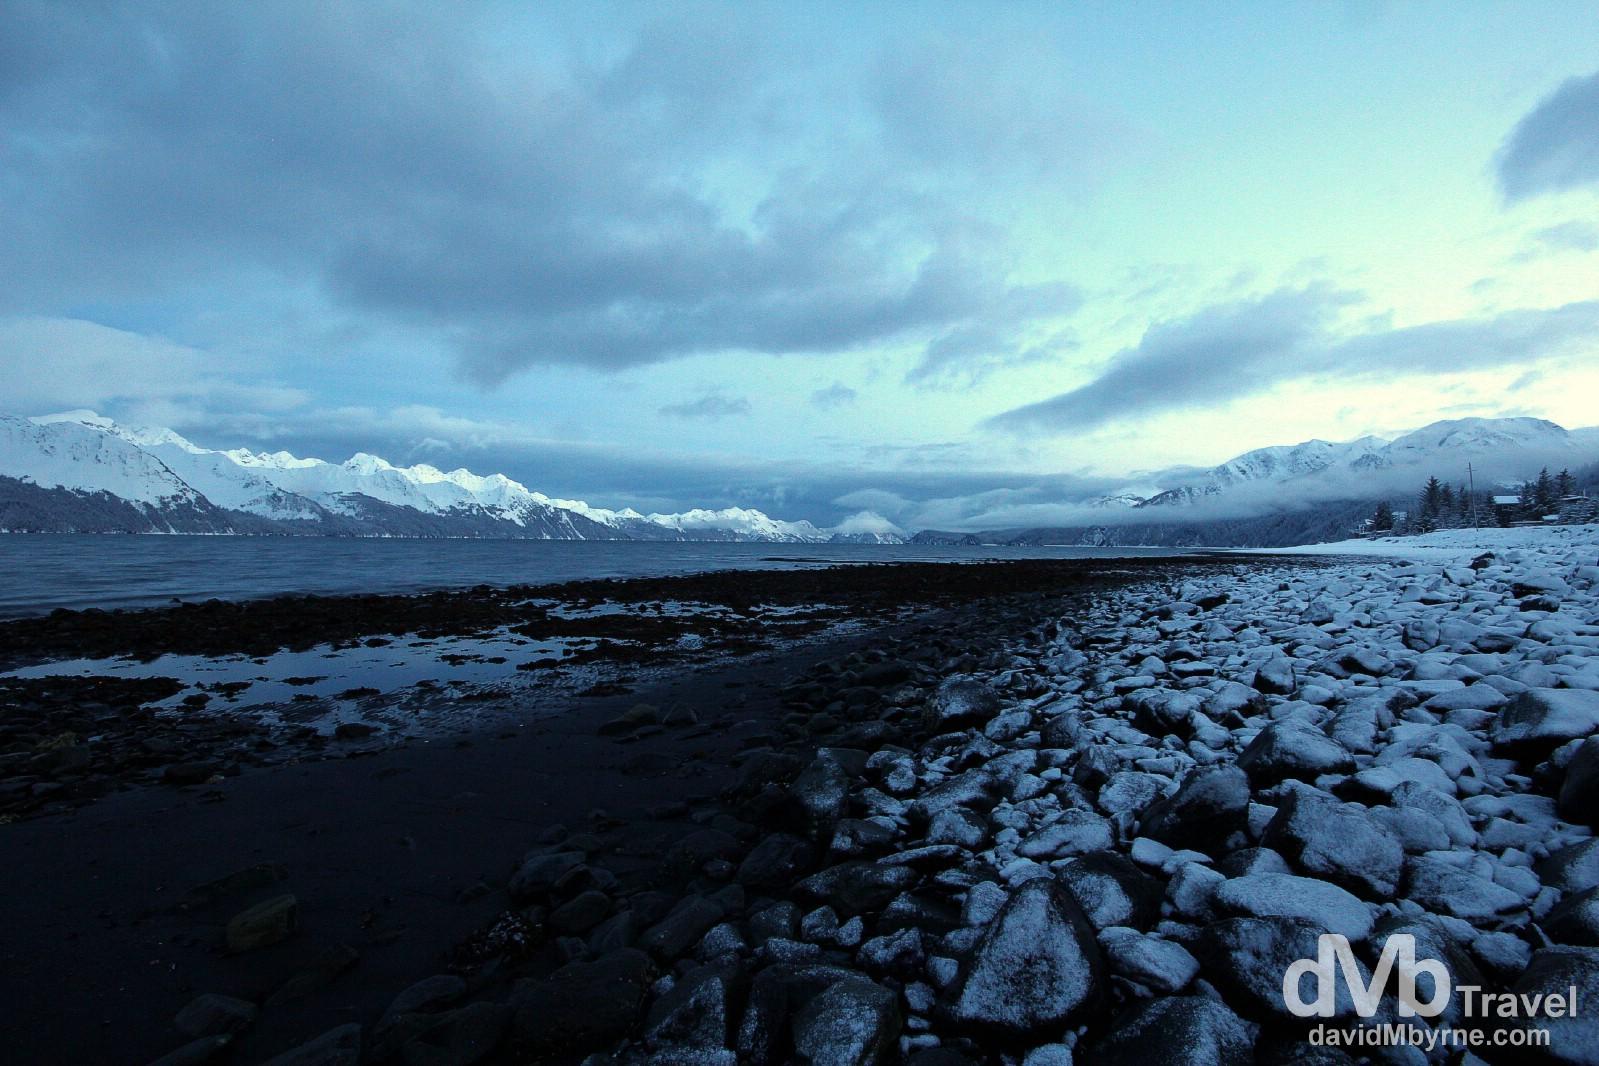 Resurrection Bay, Lowell Point, Kenai Peninsula, Alaska, USA. March 14th 2013.